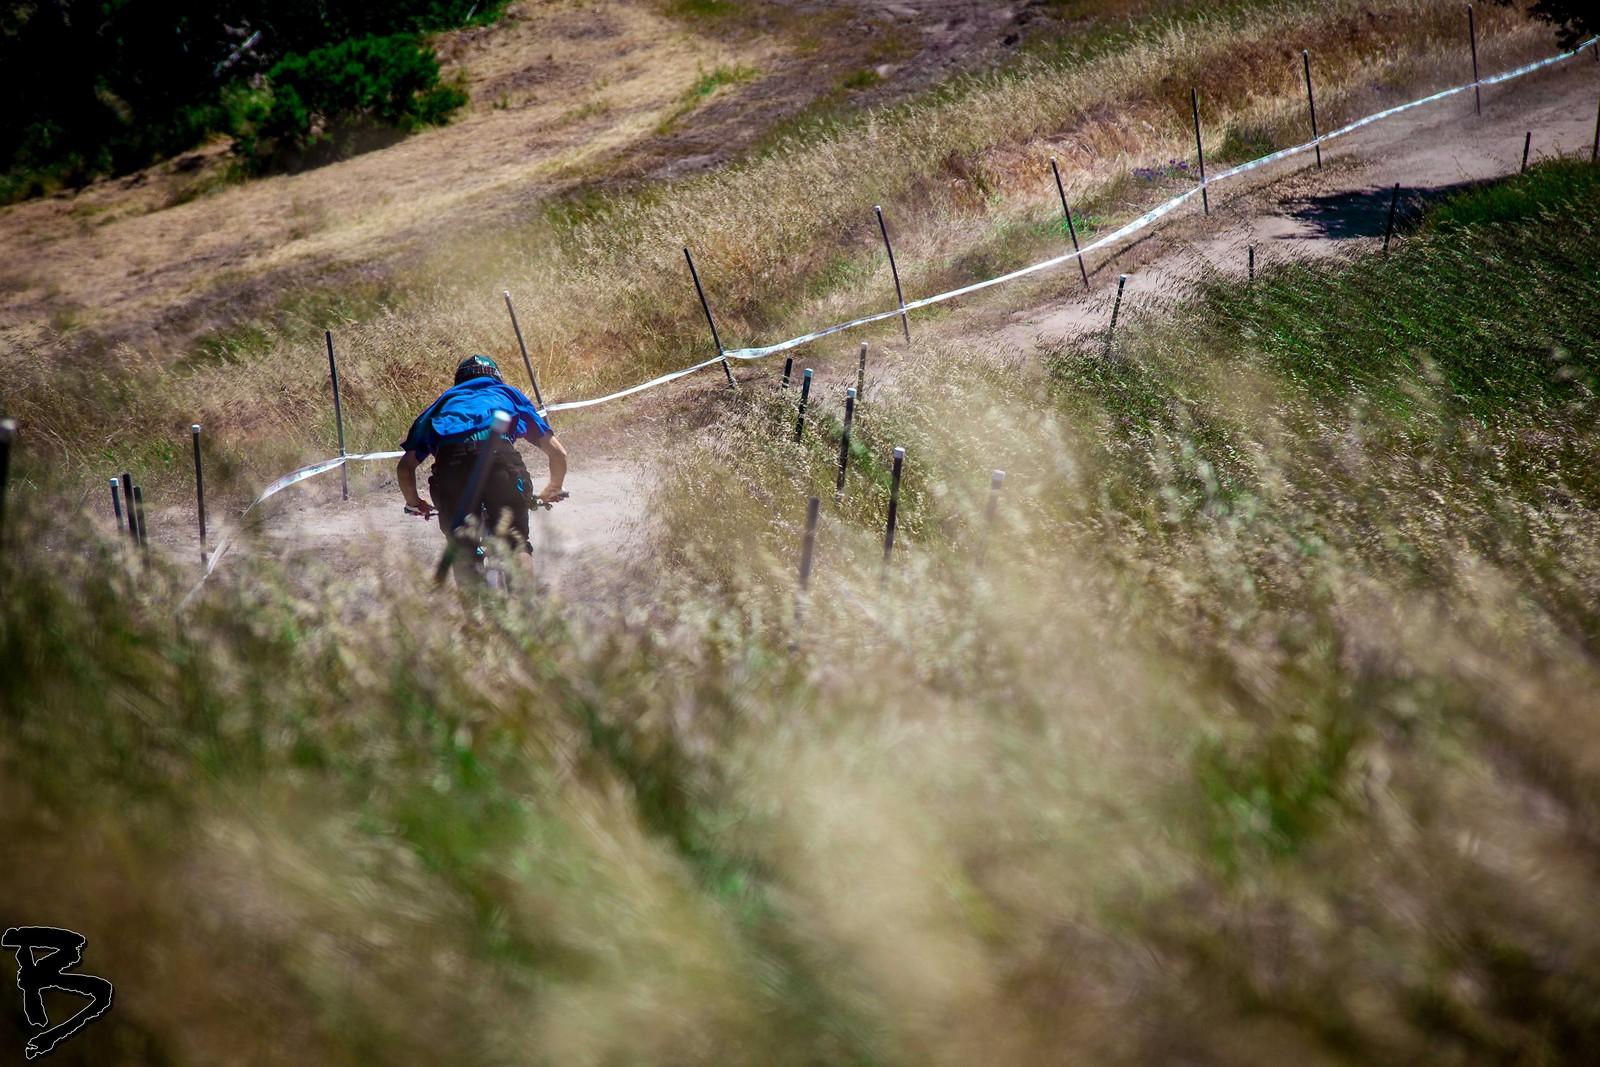 Field Shot - GnarHuck - Mountain Biking Pictures - Vital MTB